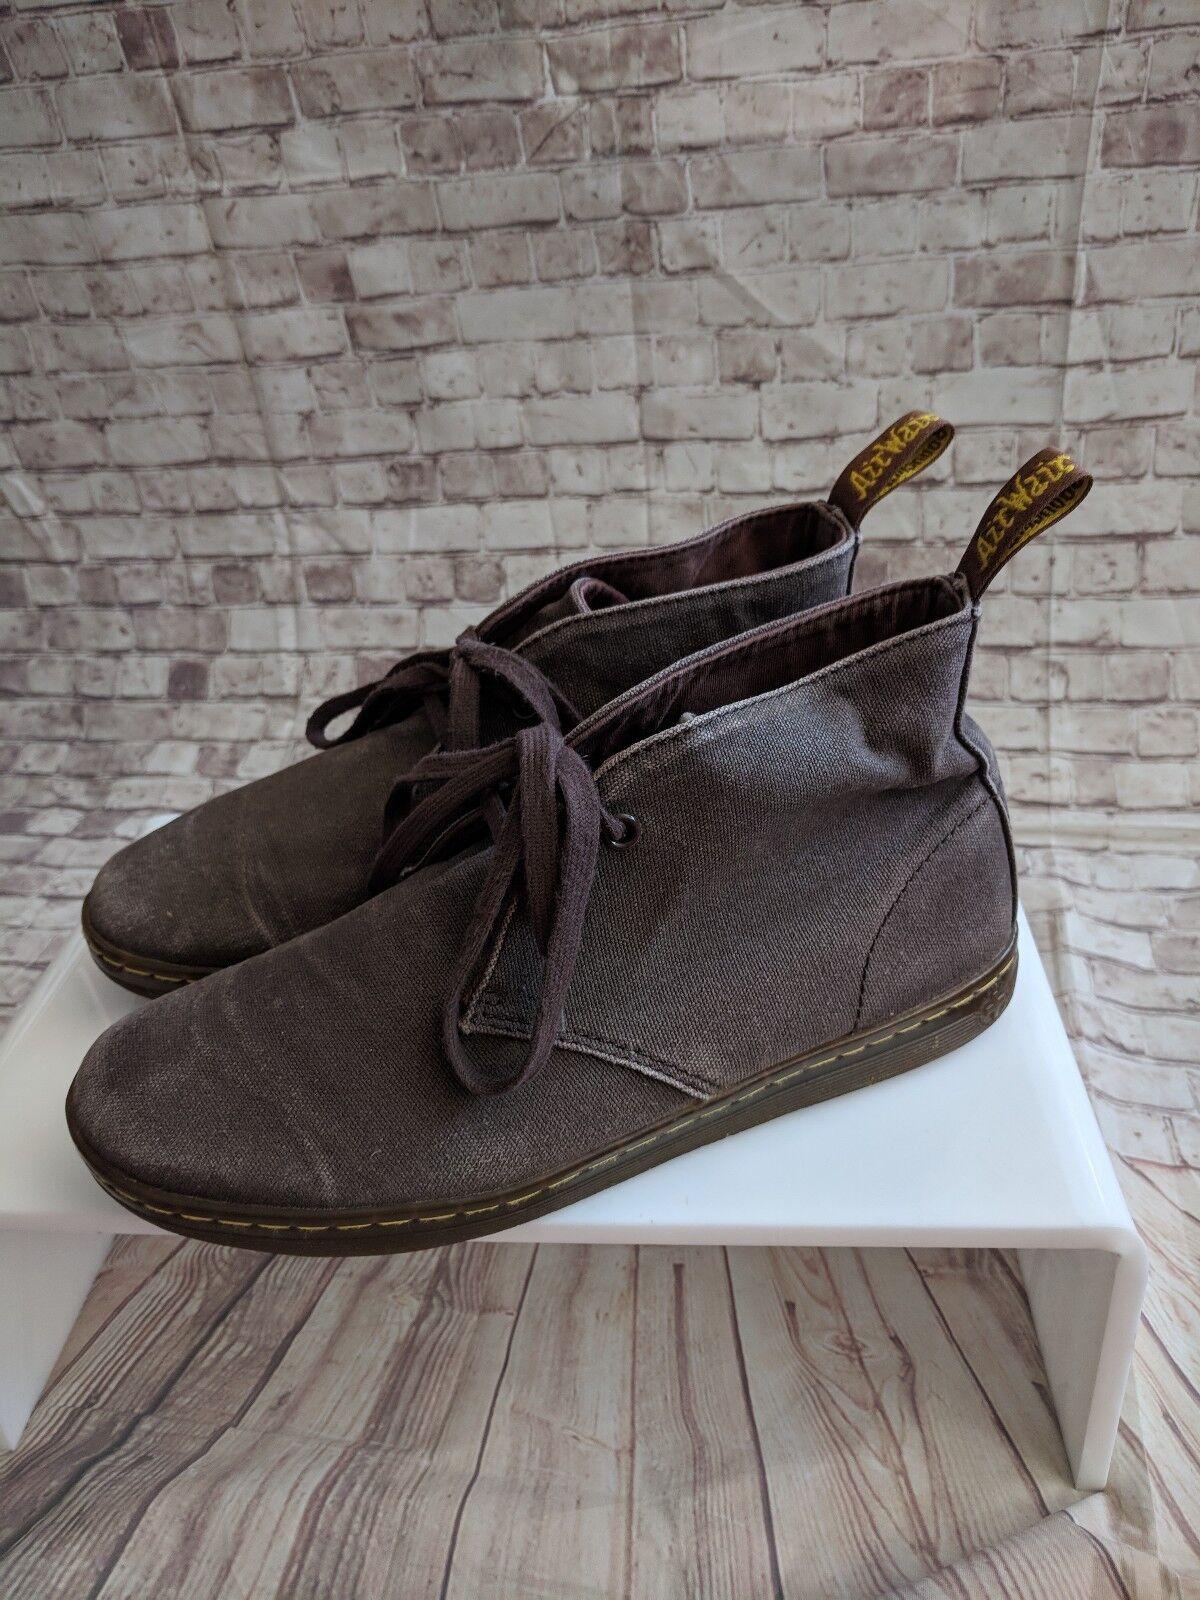 Dr. Martens Chukka Boots 9 Brown Boots Chukka men's canvas c5b265